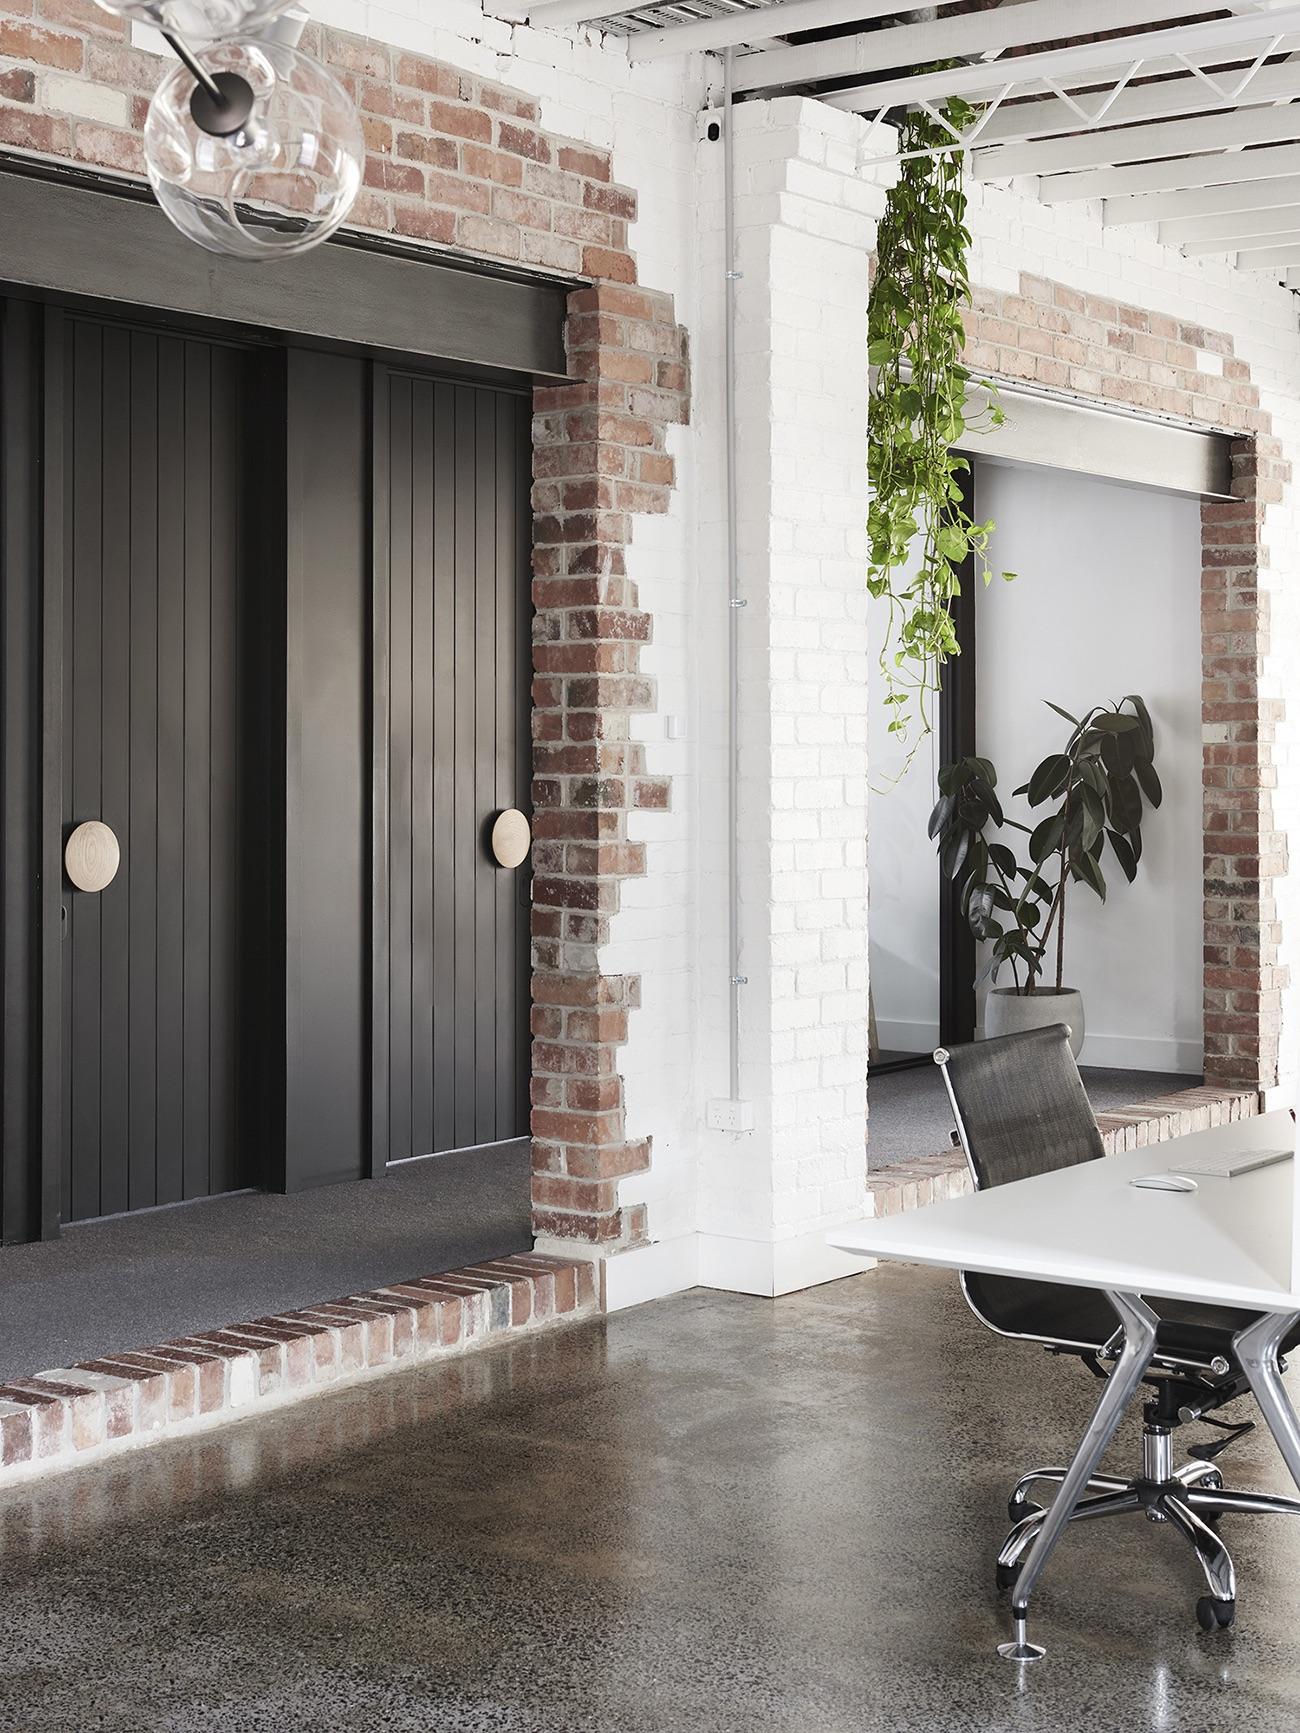 dwa-nbd-studio-office-13